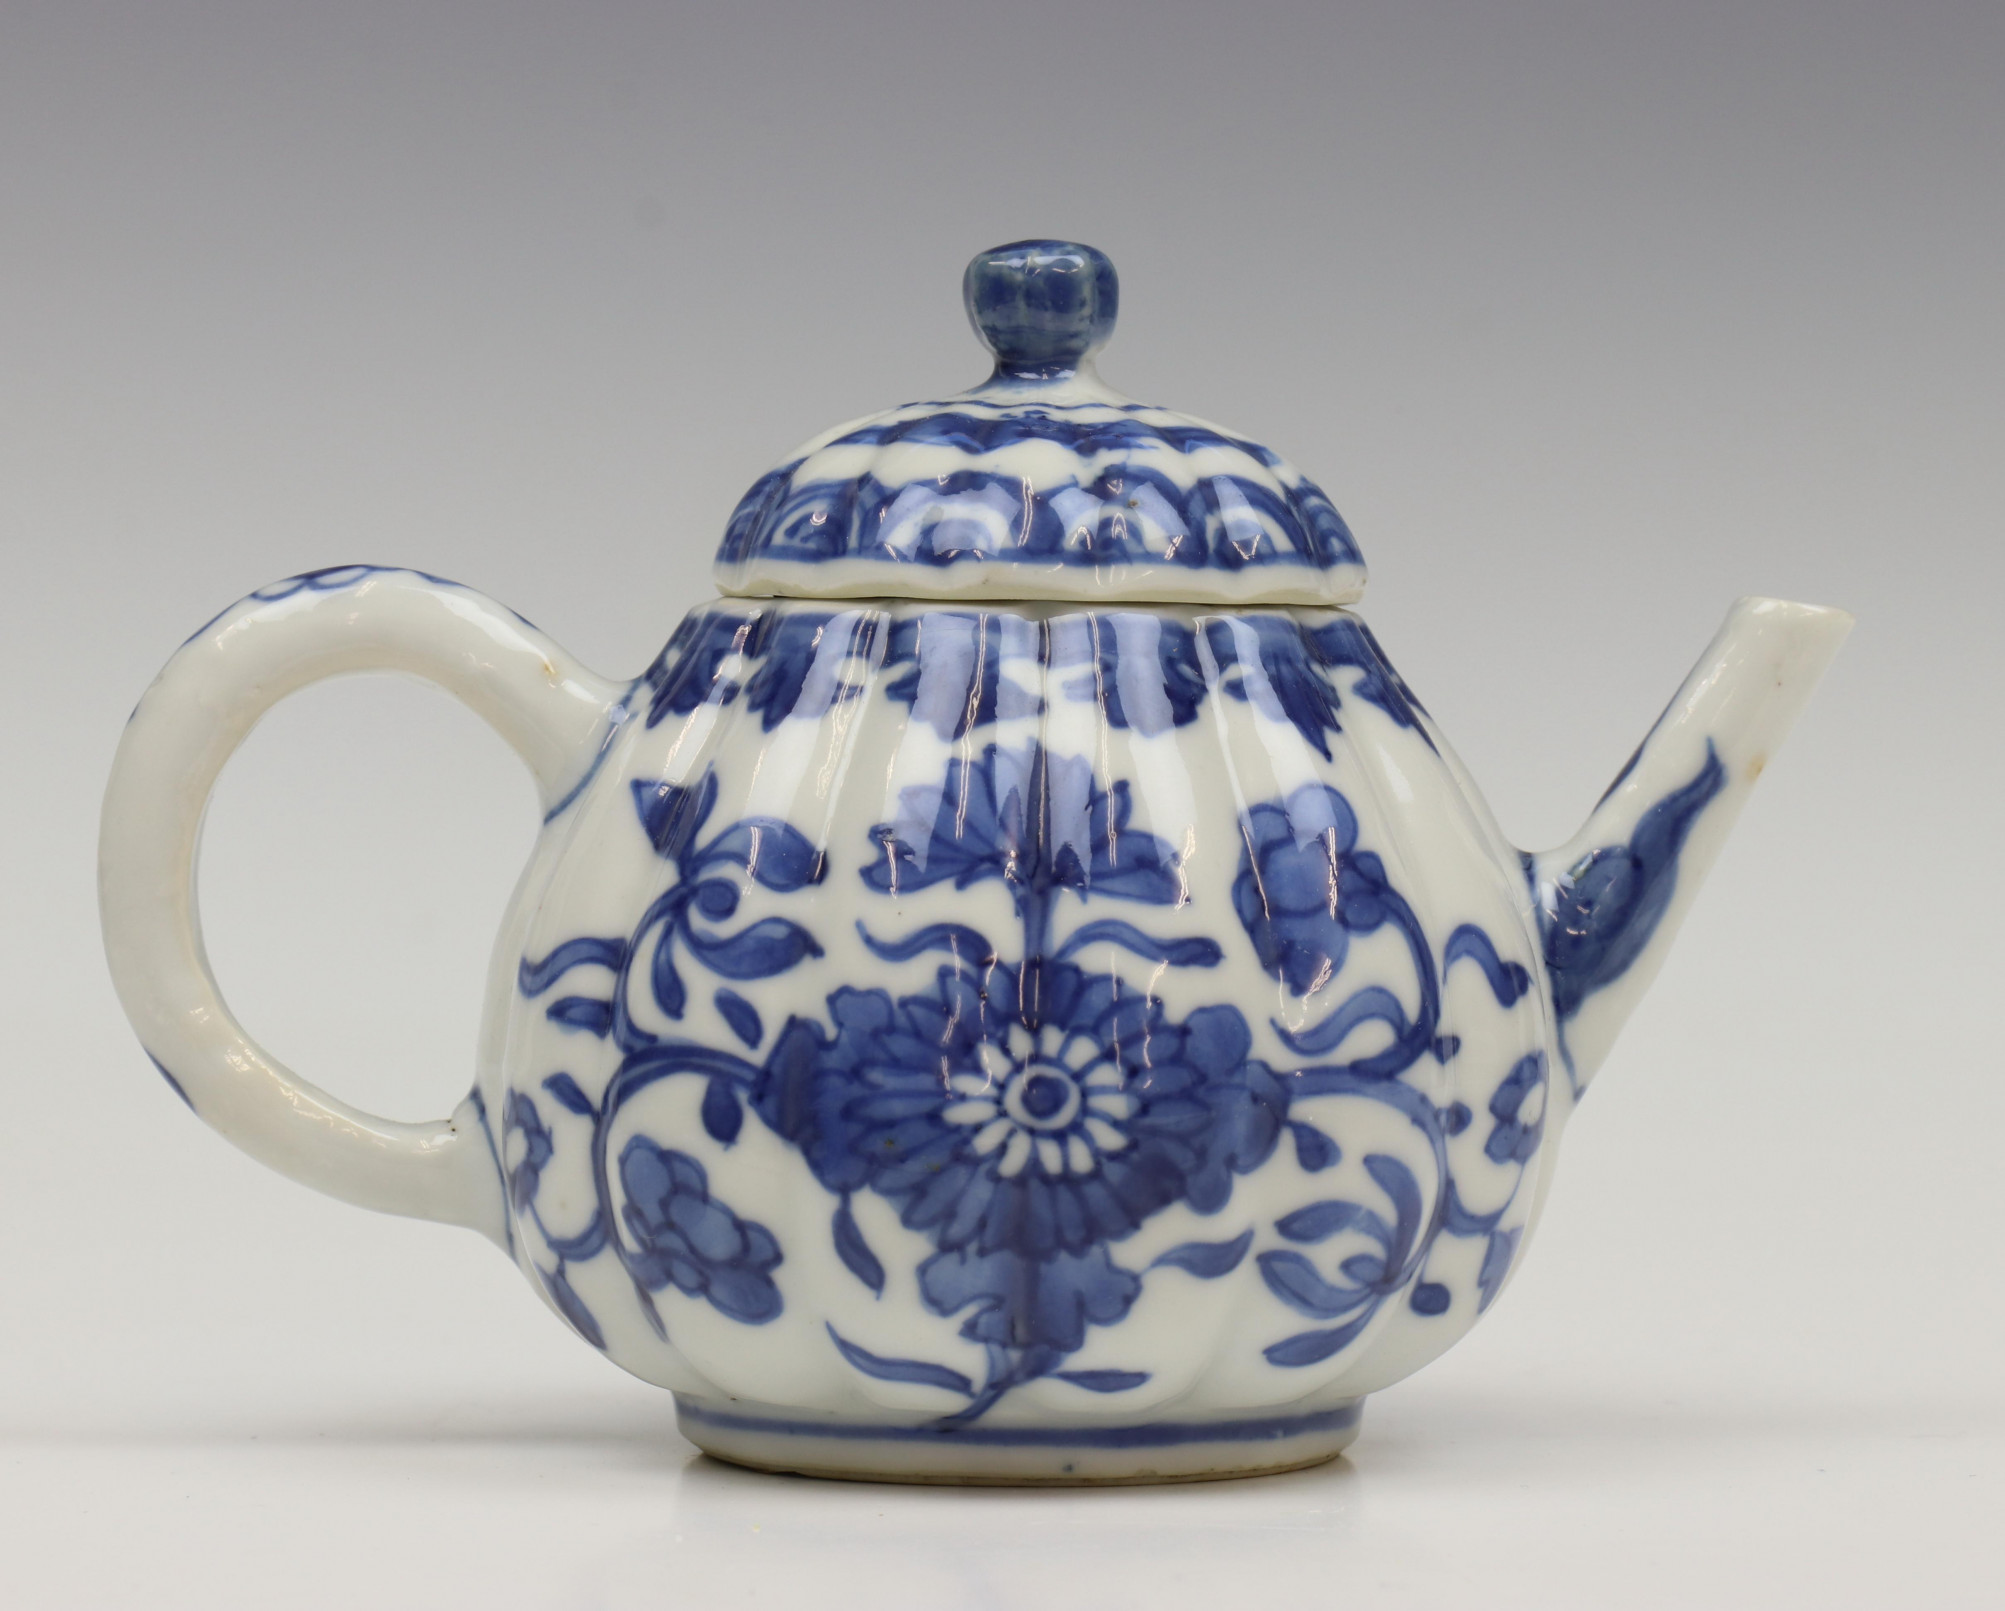 China, blauw-wit porseleinen gelobd trekpotje, Kangxi,